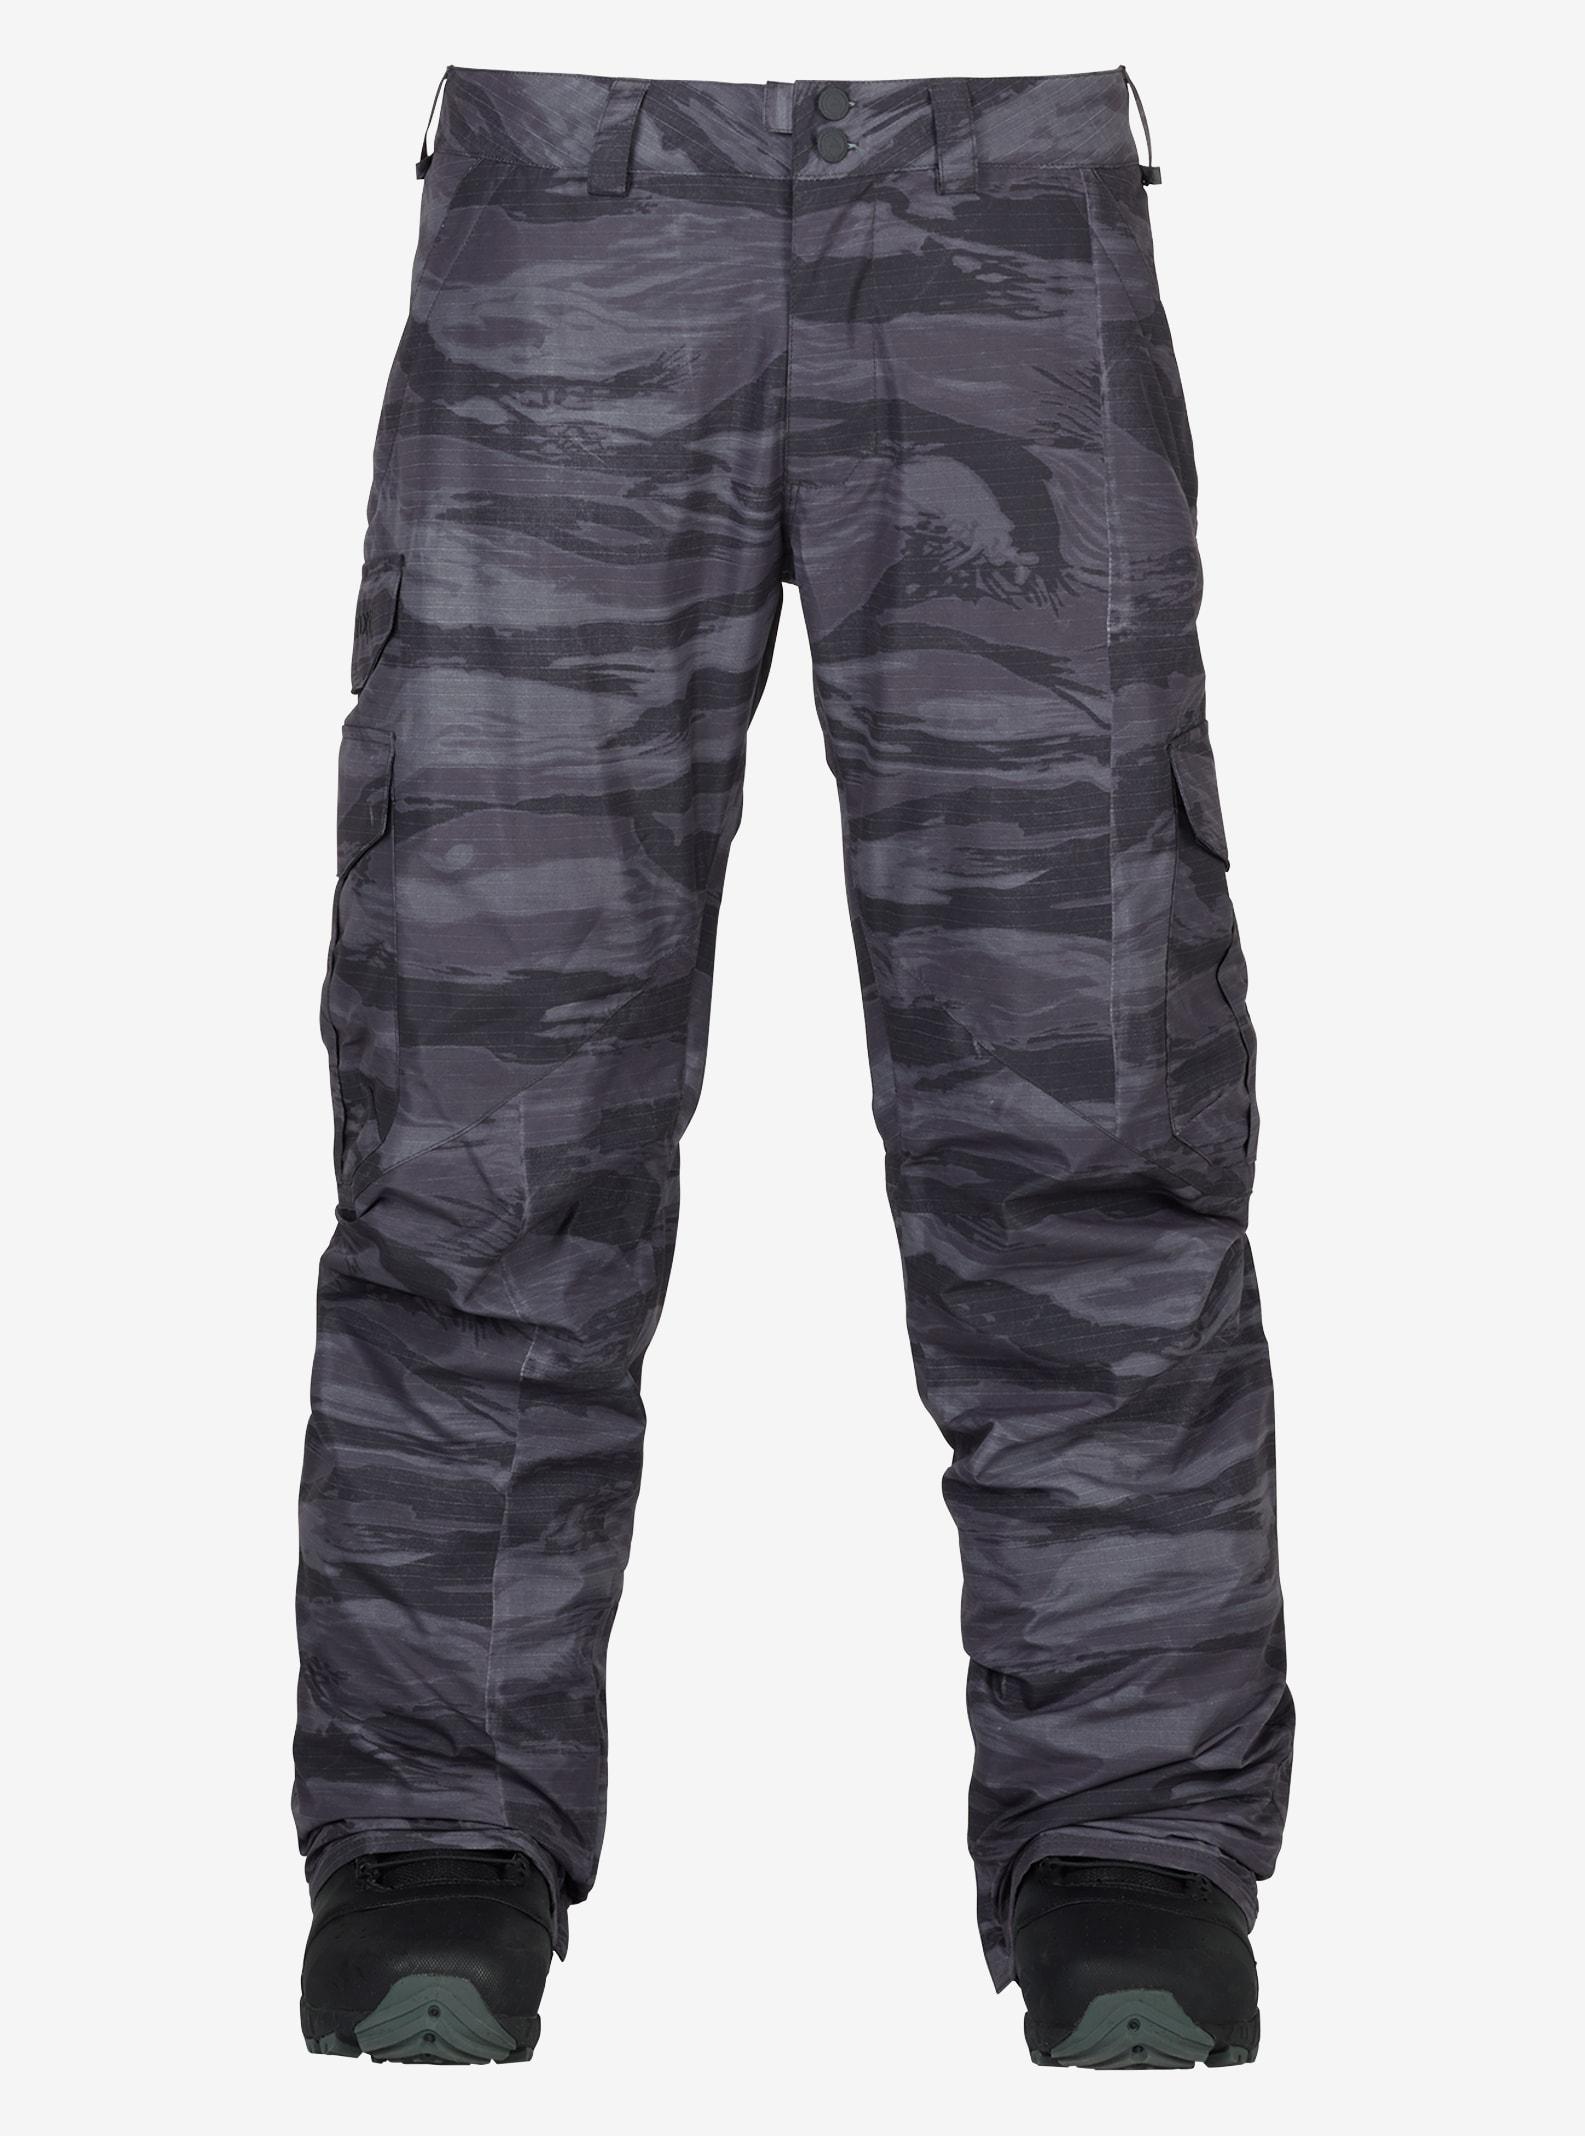 Men's Burton Cargo Pant - Regular Fit shown in Faded Worn Tiger